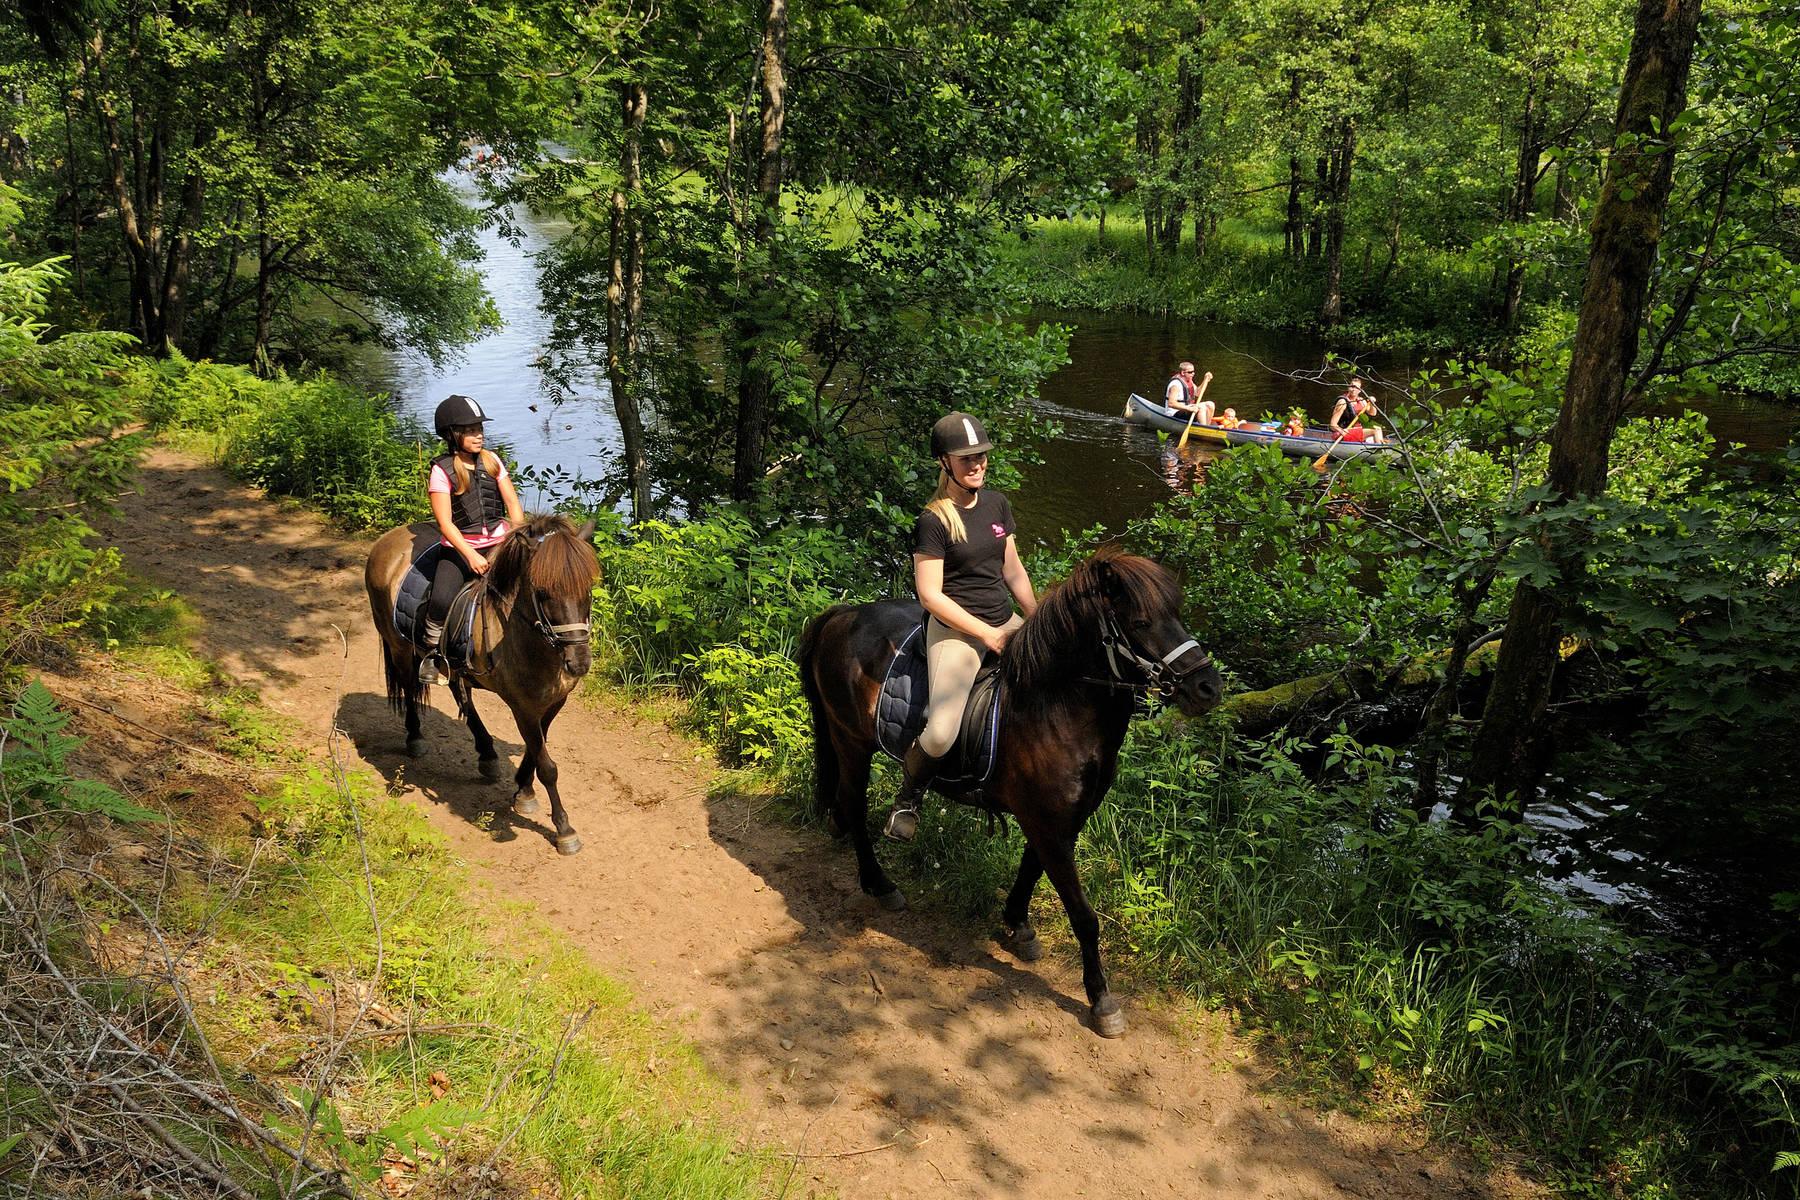 Riding along the river at Kyrkekvarn